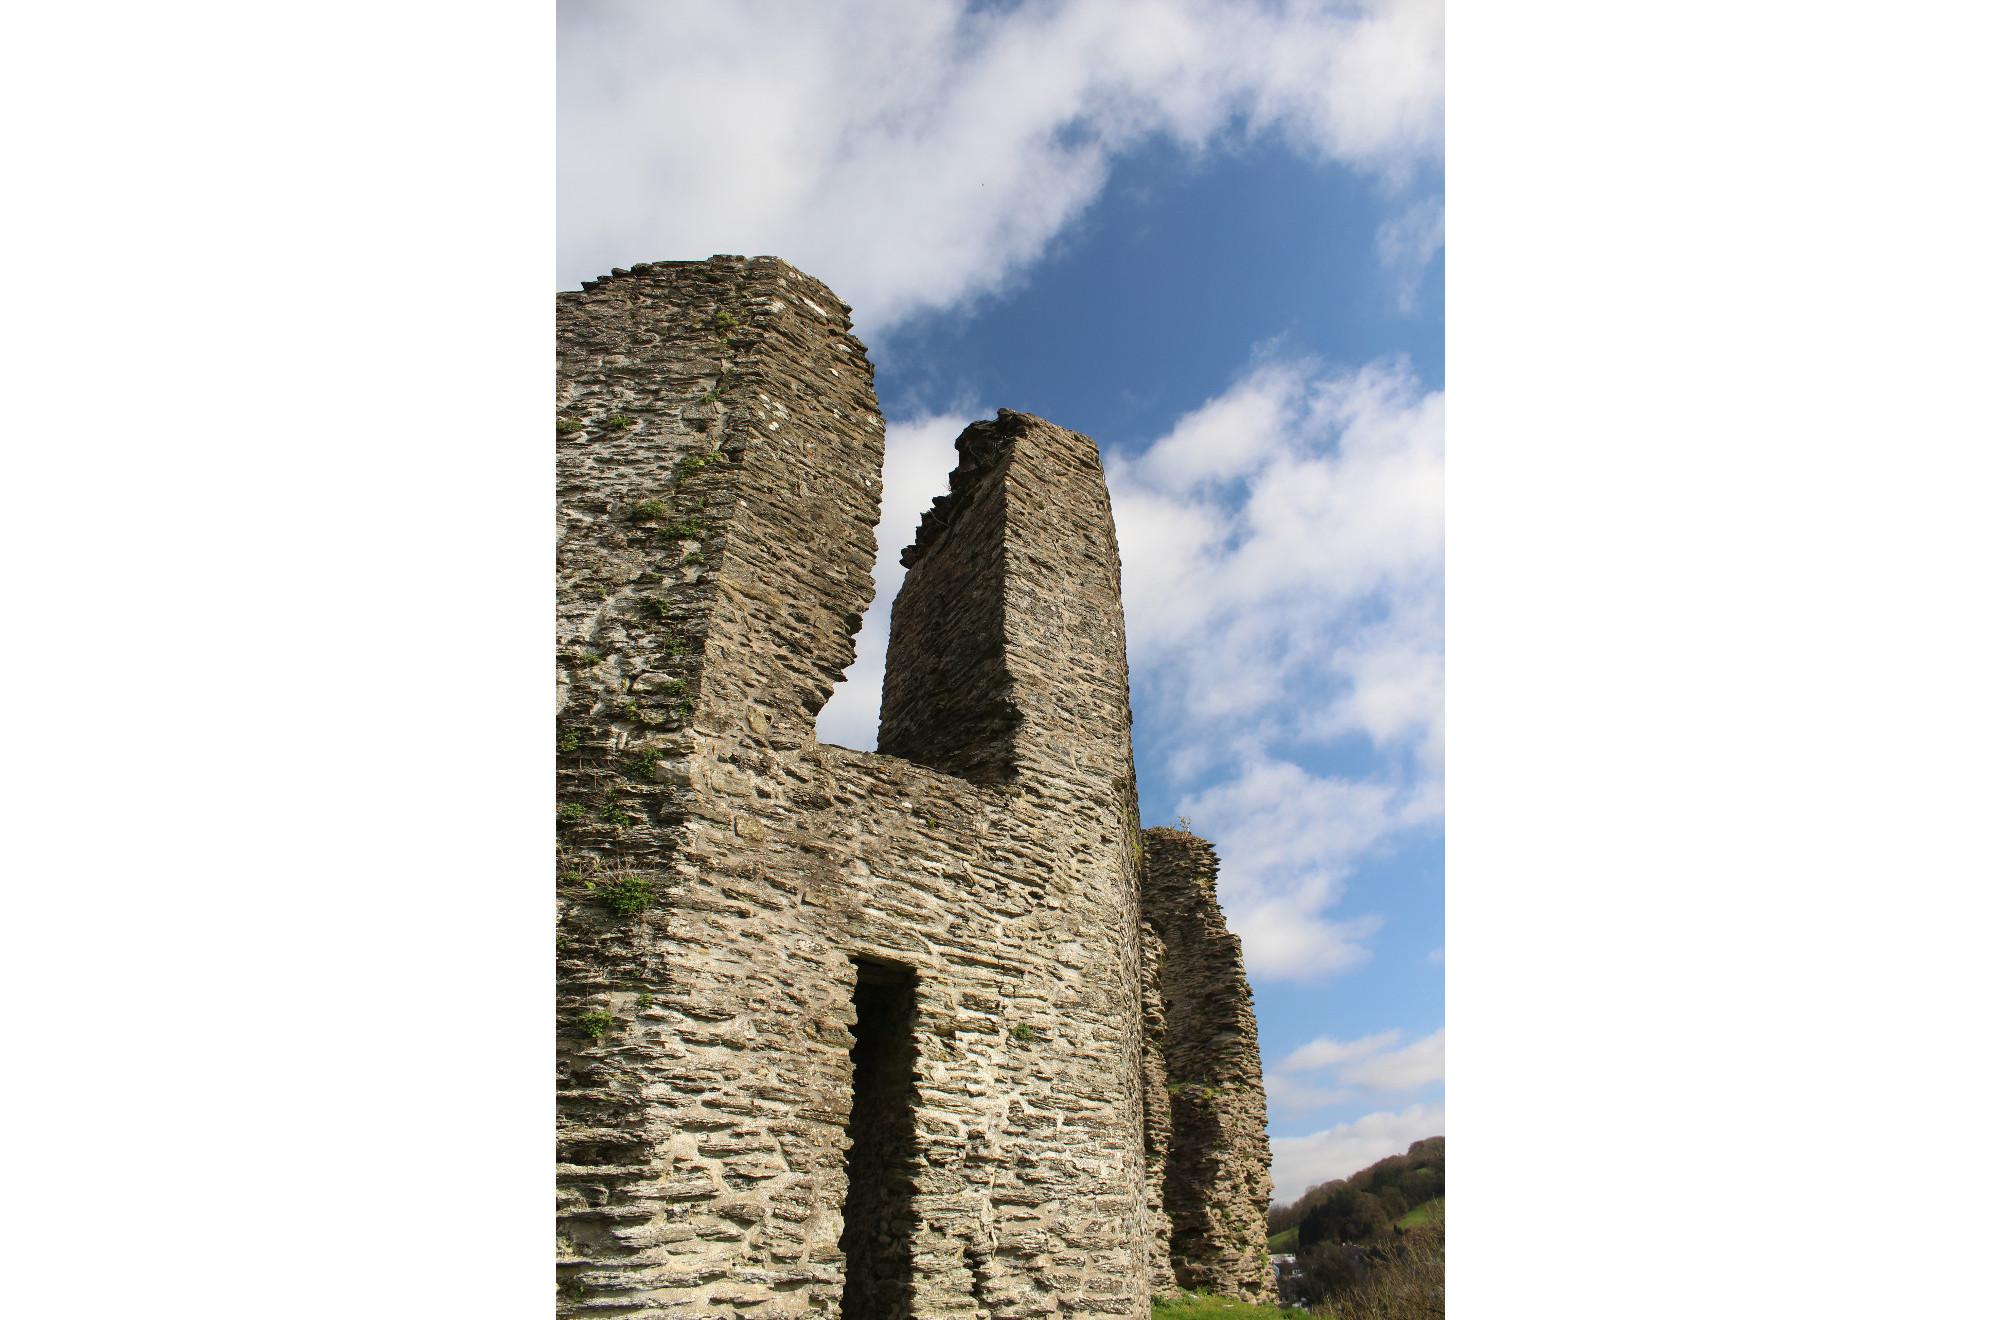 Newcastle Emlyn Castle (Carmarthenshire, Wales)